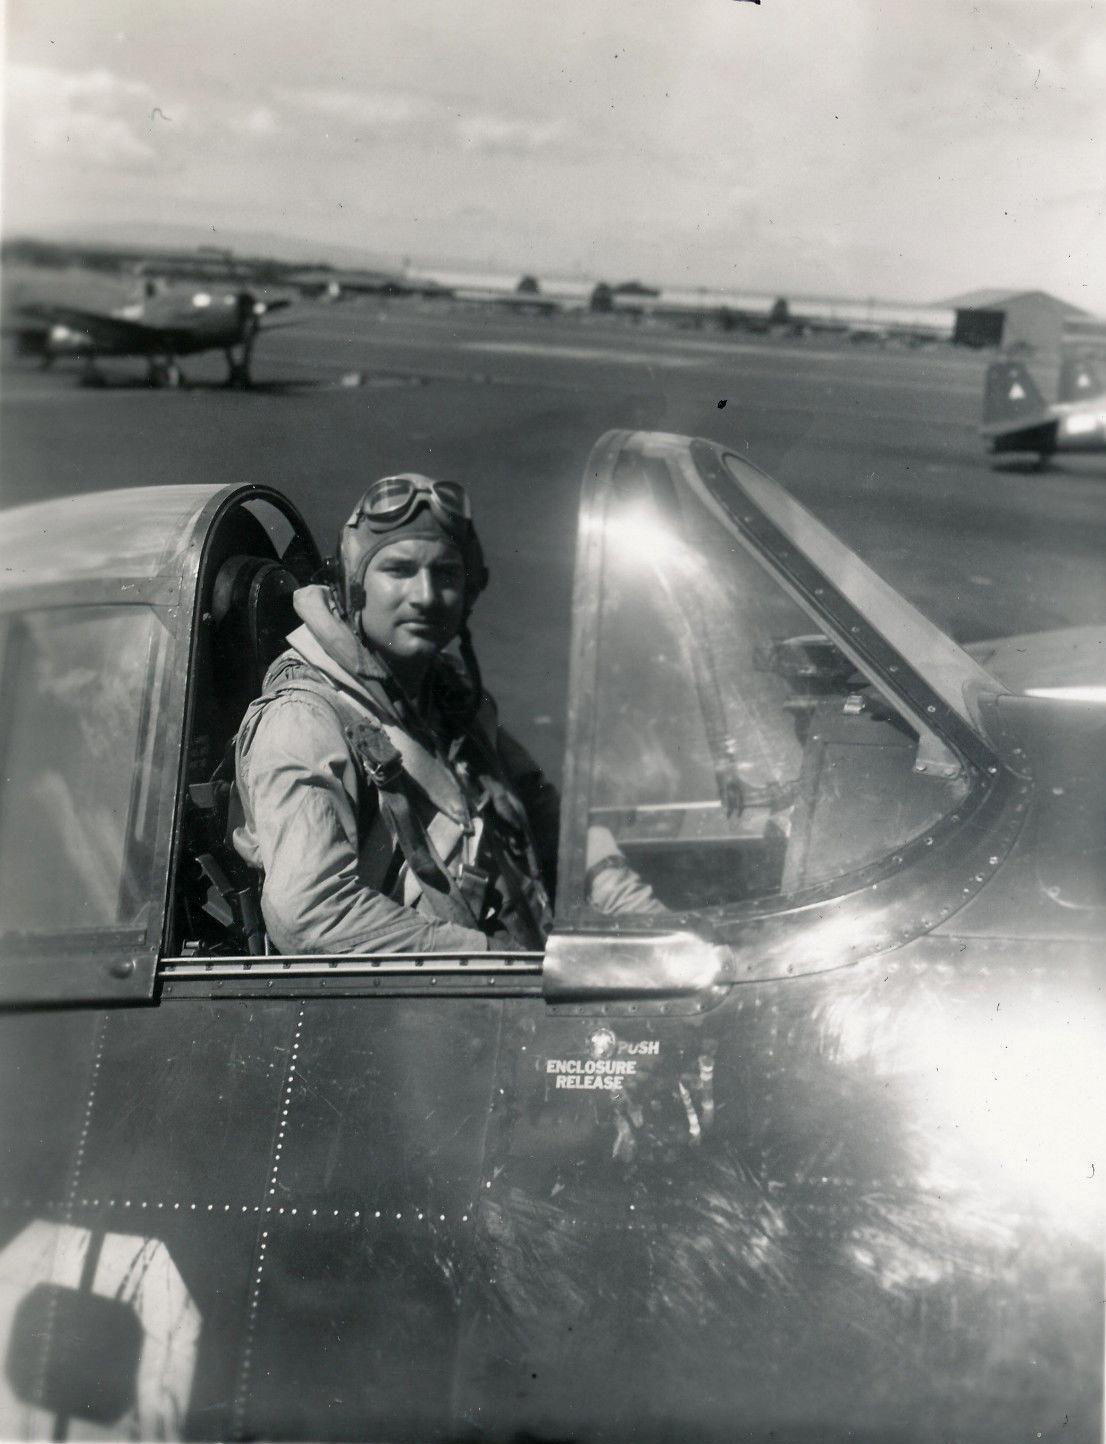 Aircrew USN VBF 8 Lt Maggie Magee division leader NAS Puunene 1945 01